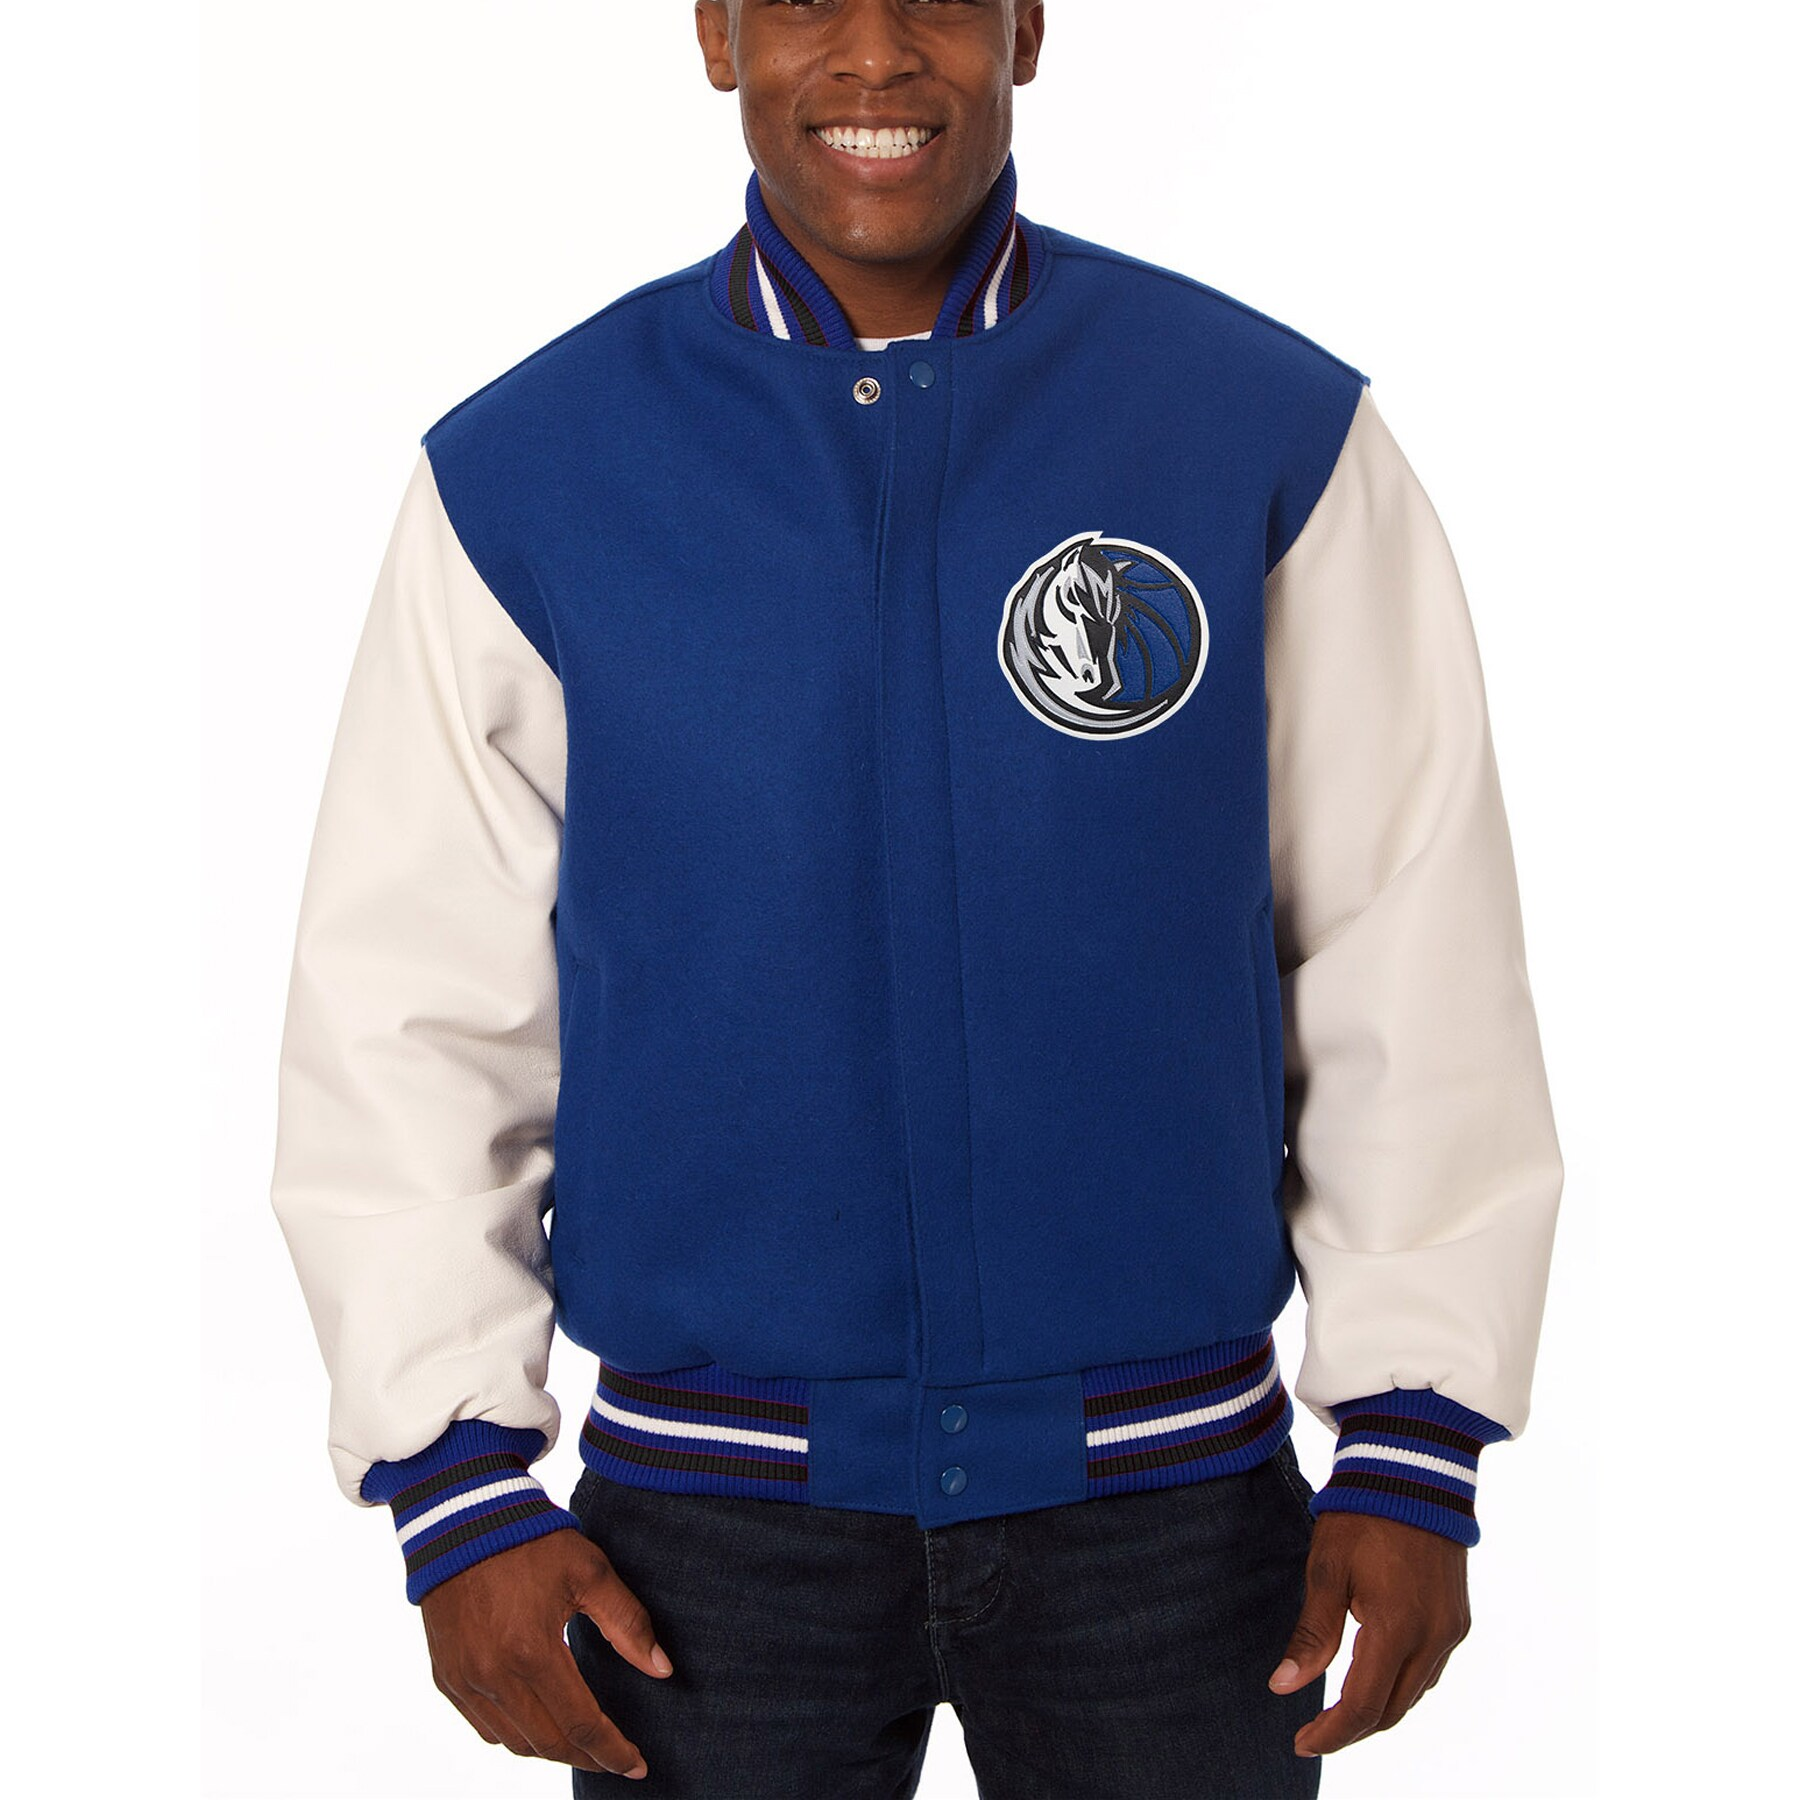 Dallas Mavericks JH Design Domestic Two-Tone Wool and Leather Jacket - Royal